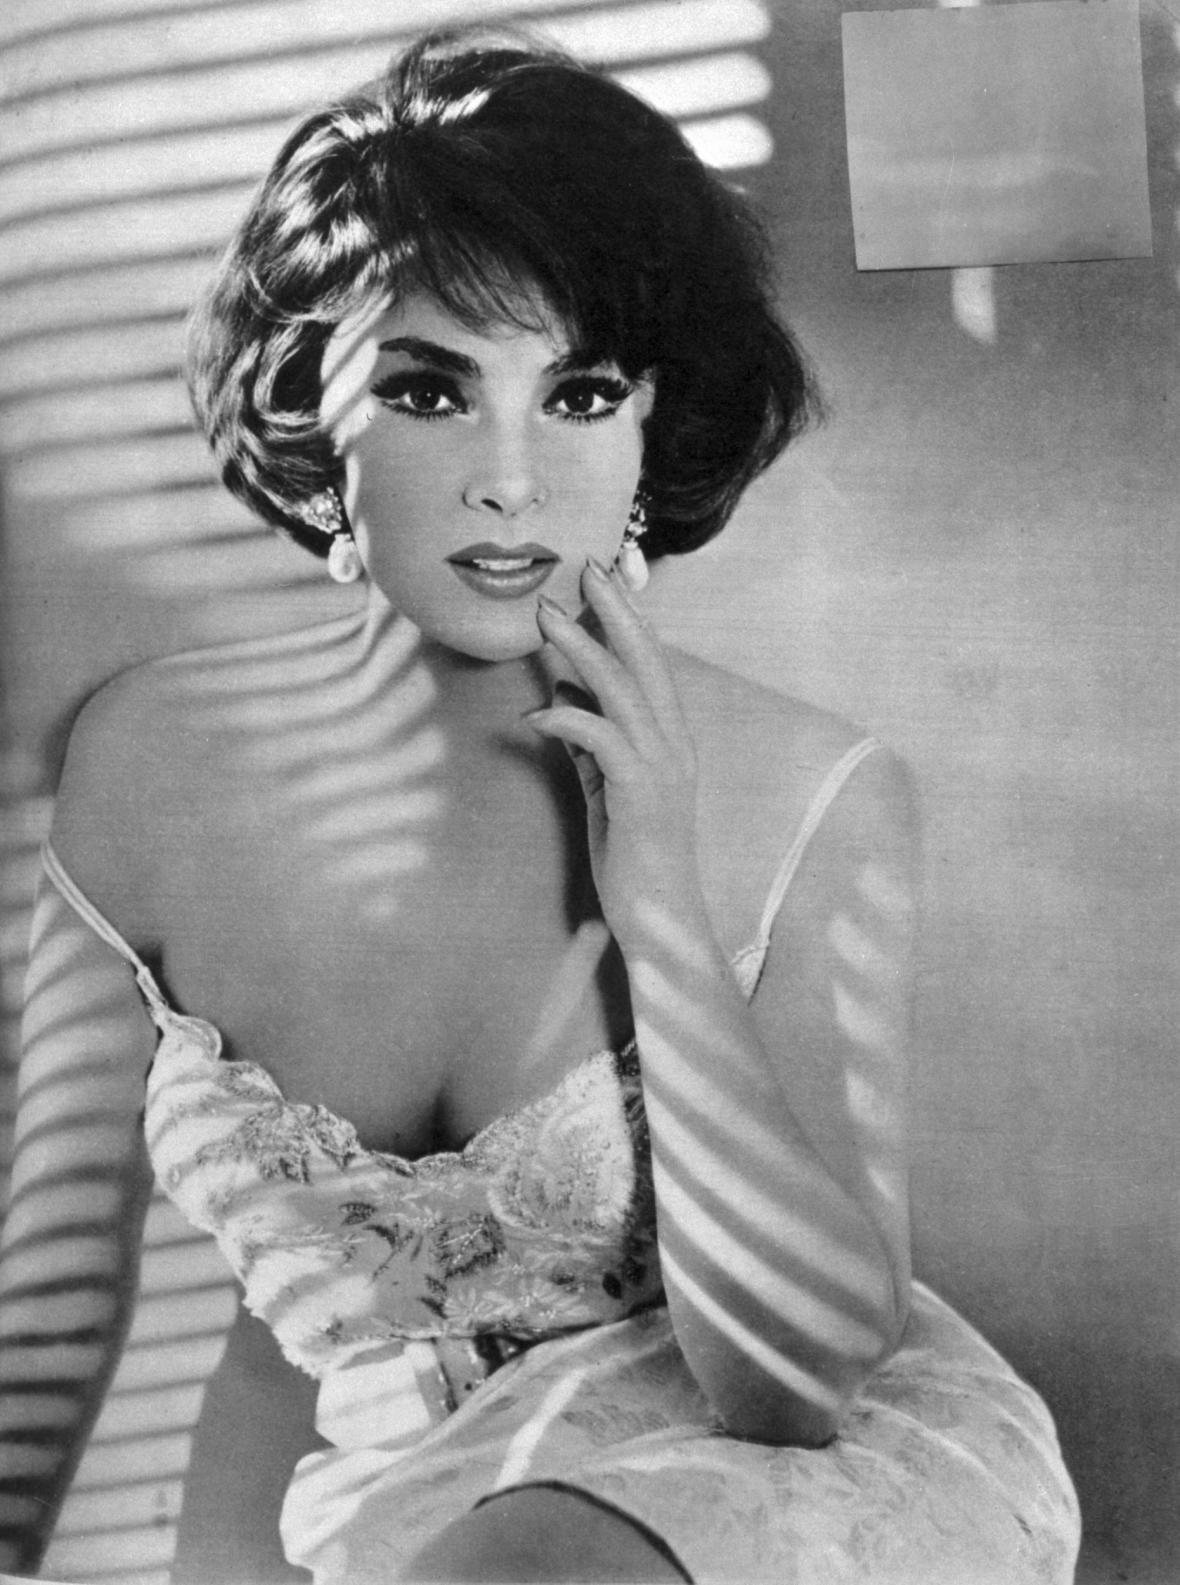 Gina Lollobrigida (1963)